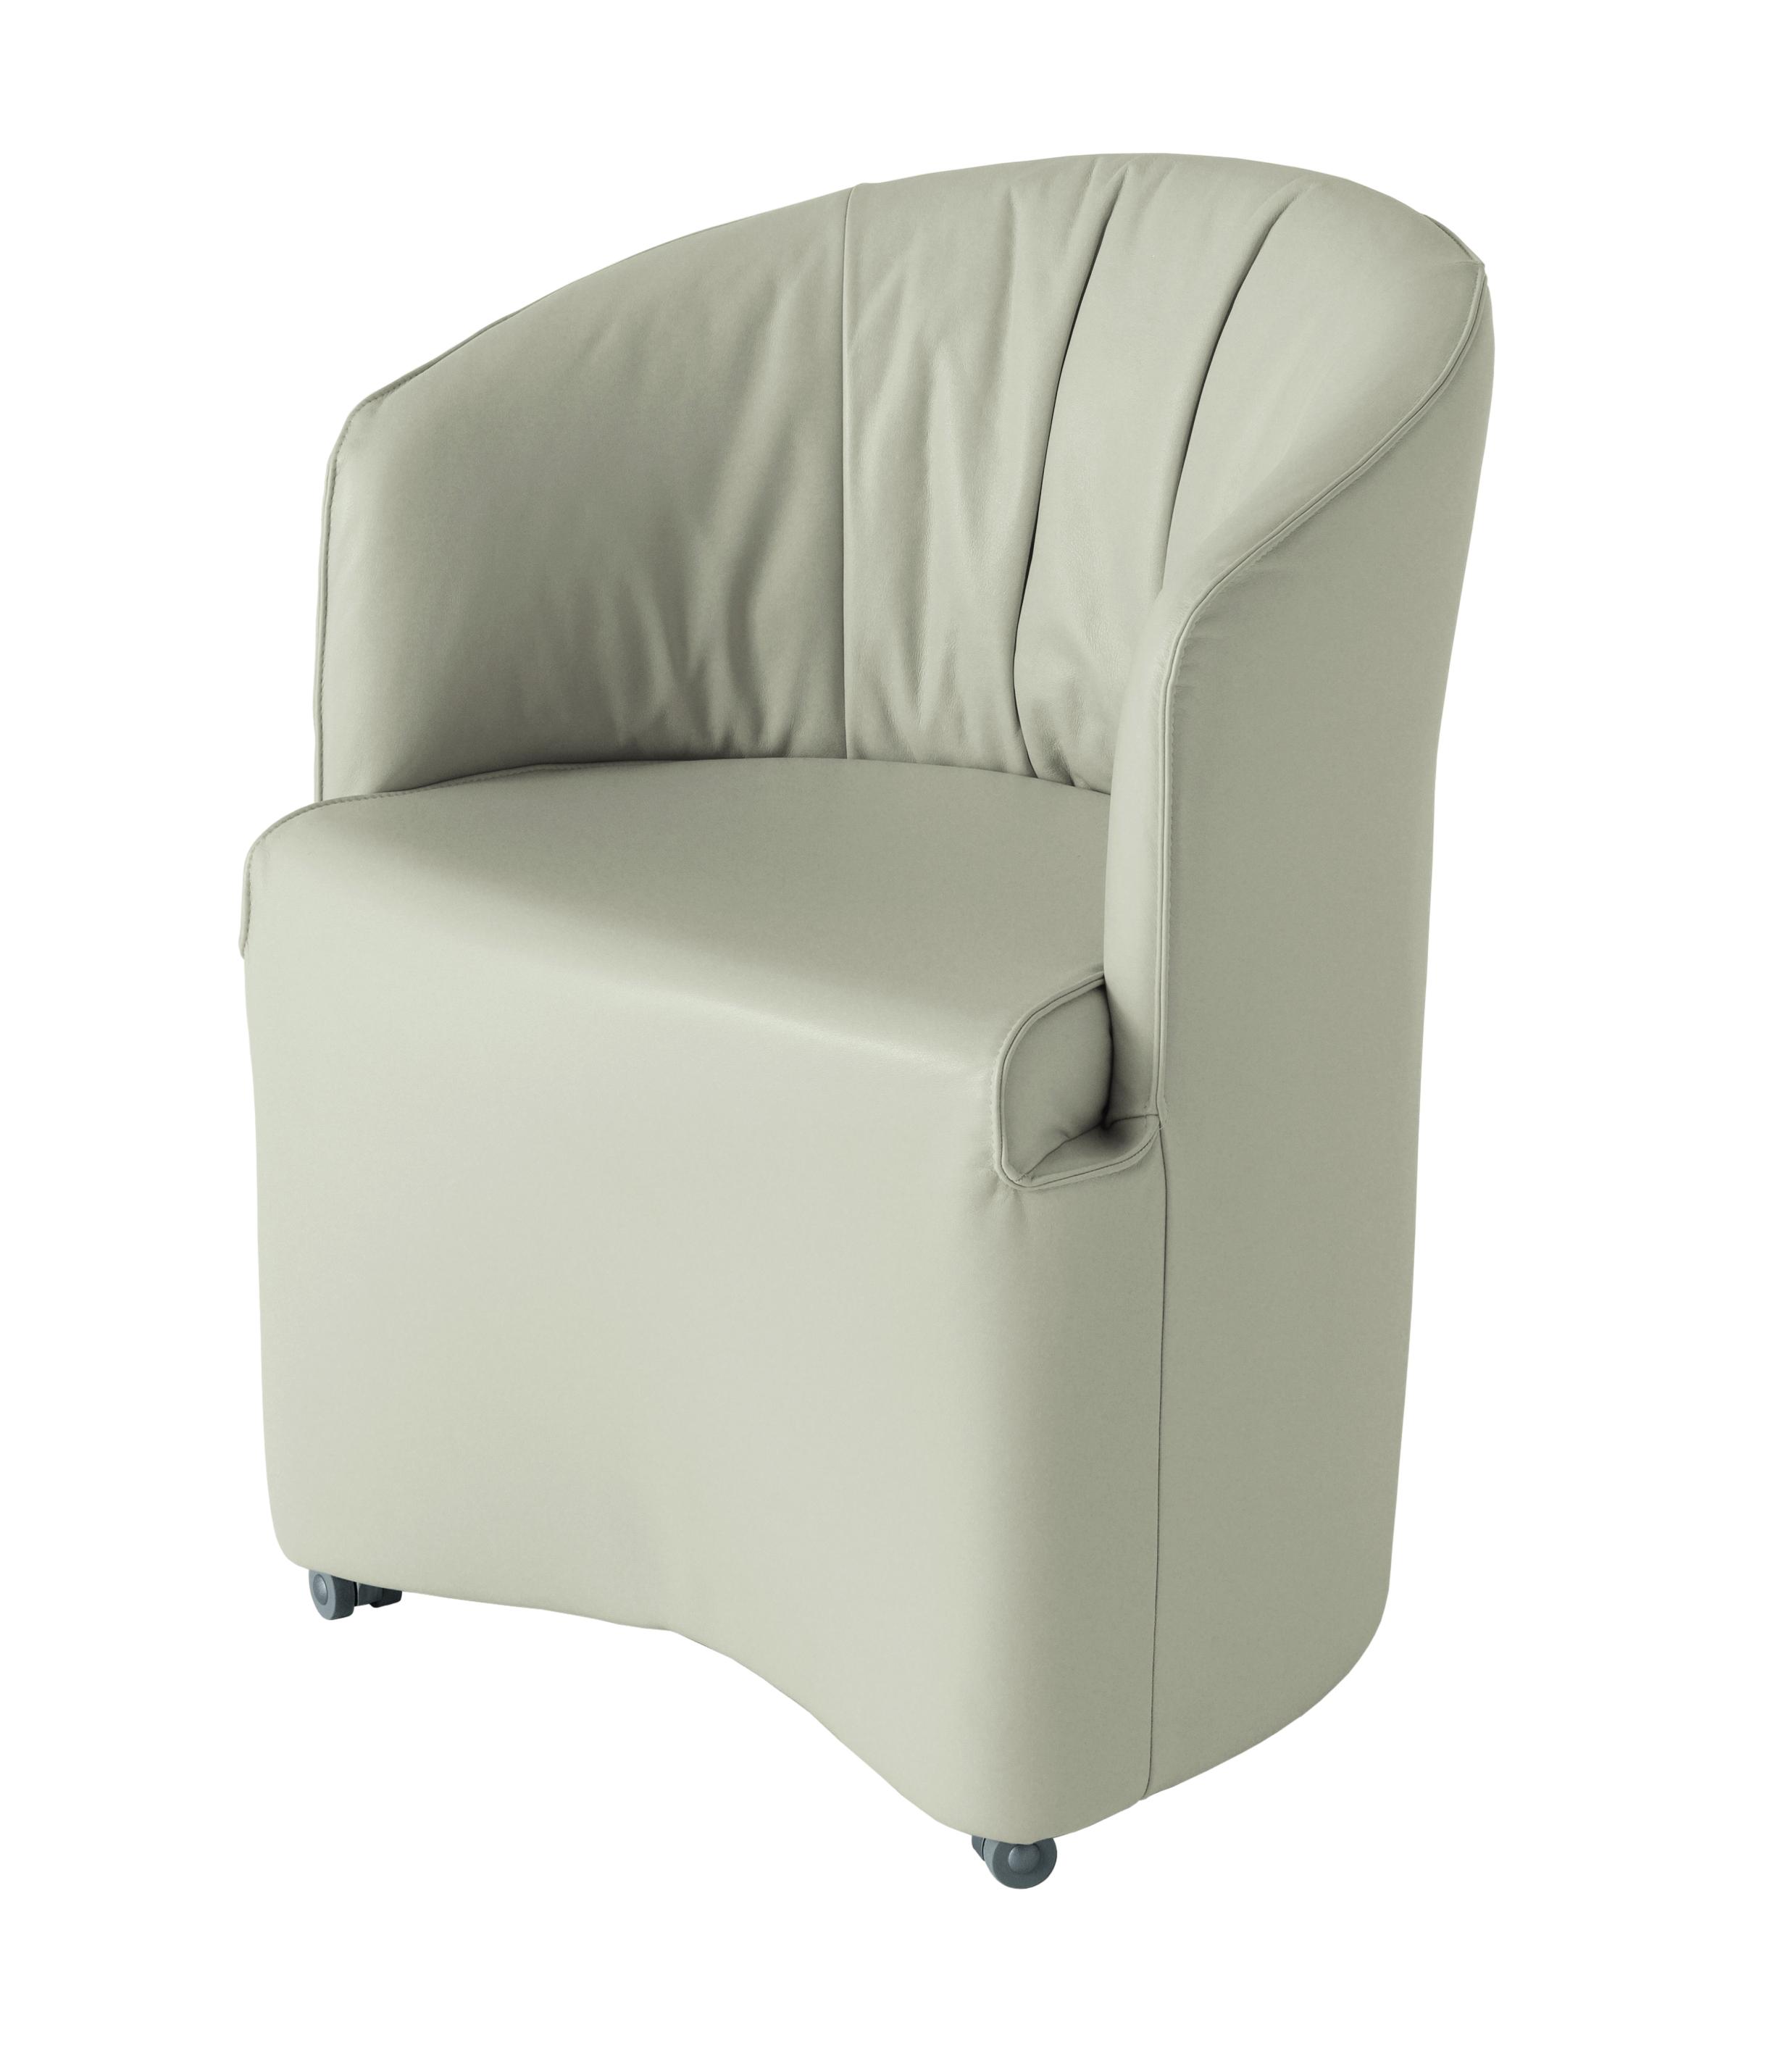 opera-dinner-chair-01-HR.jpg